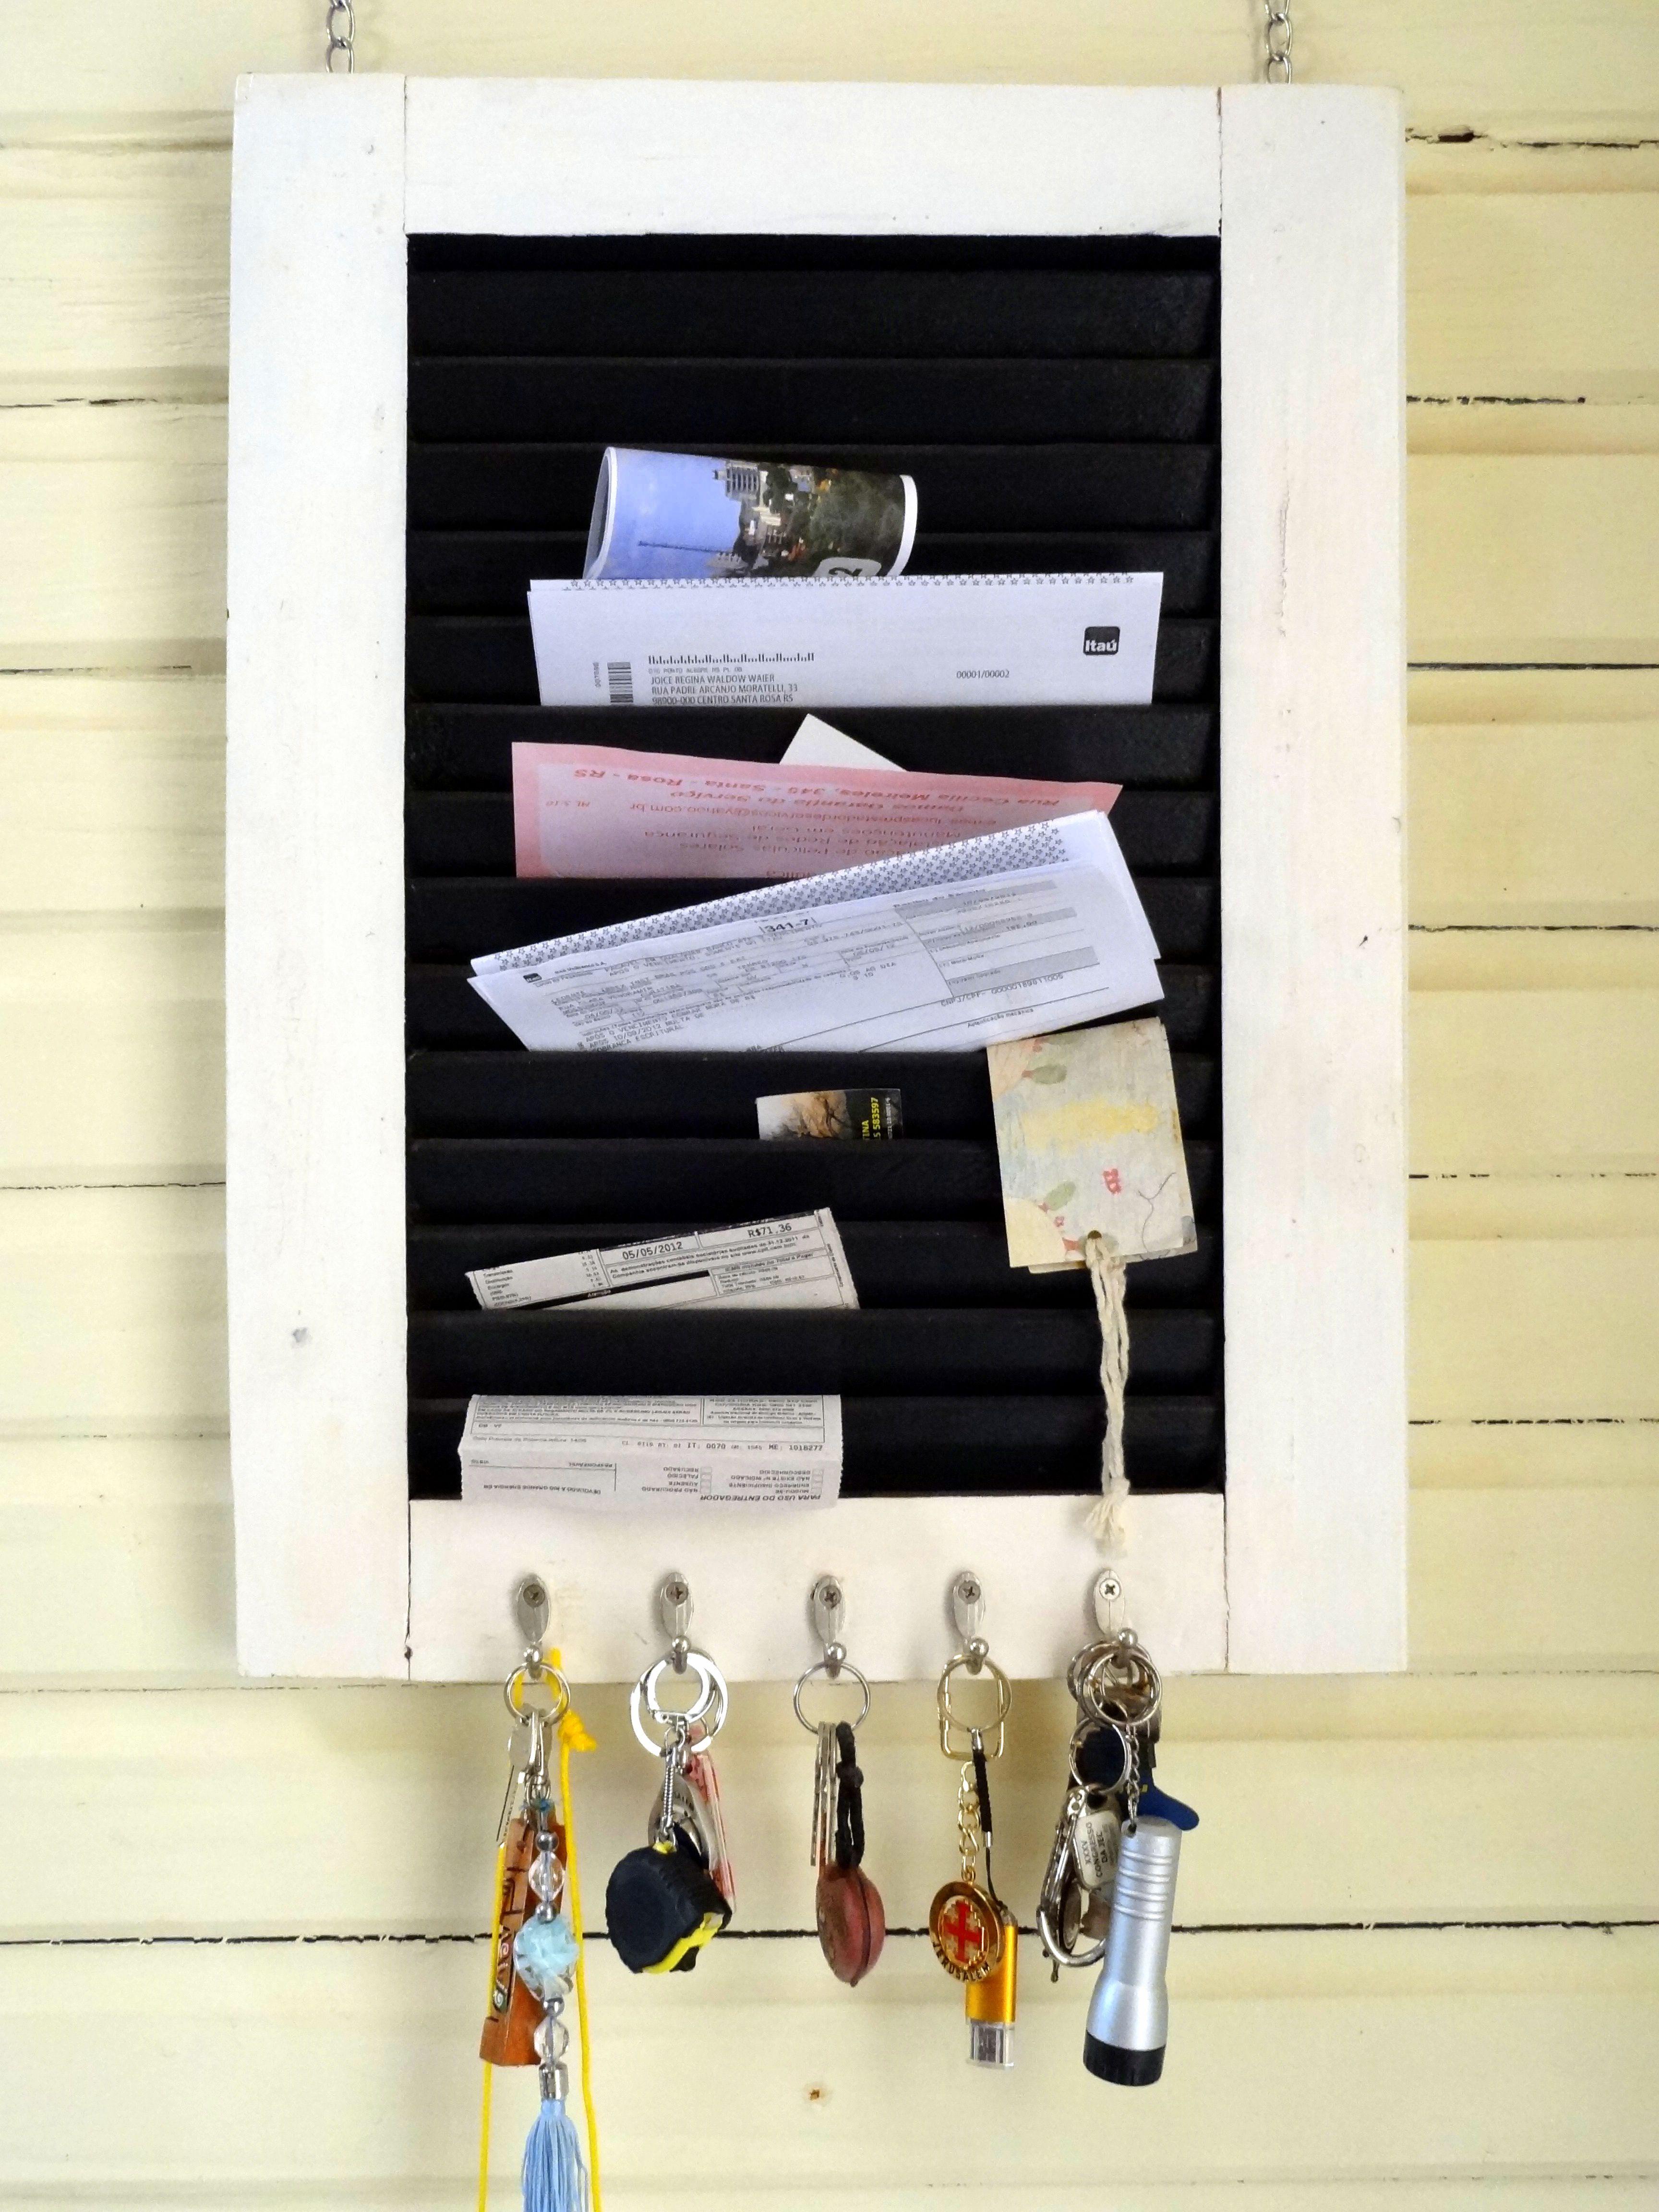 Janela que seria descartada, vira porta chaves e contas a pagar! super útil!